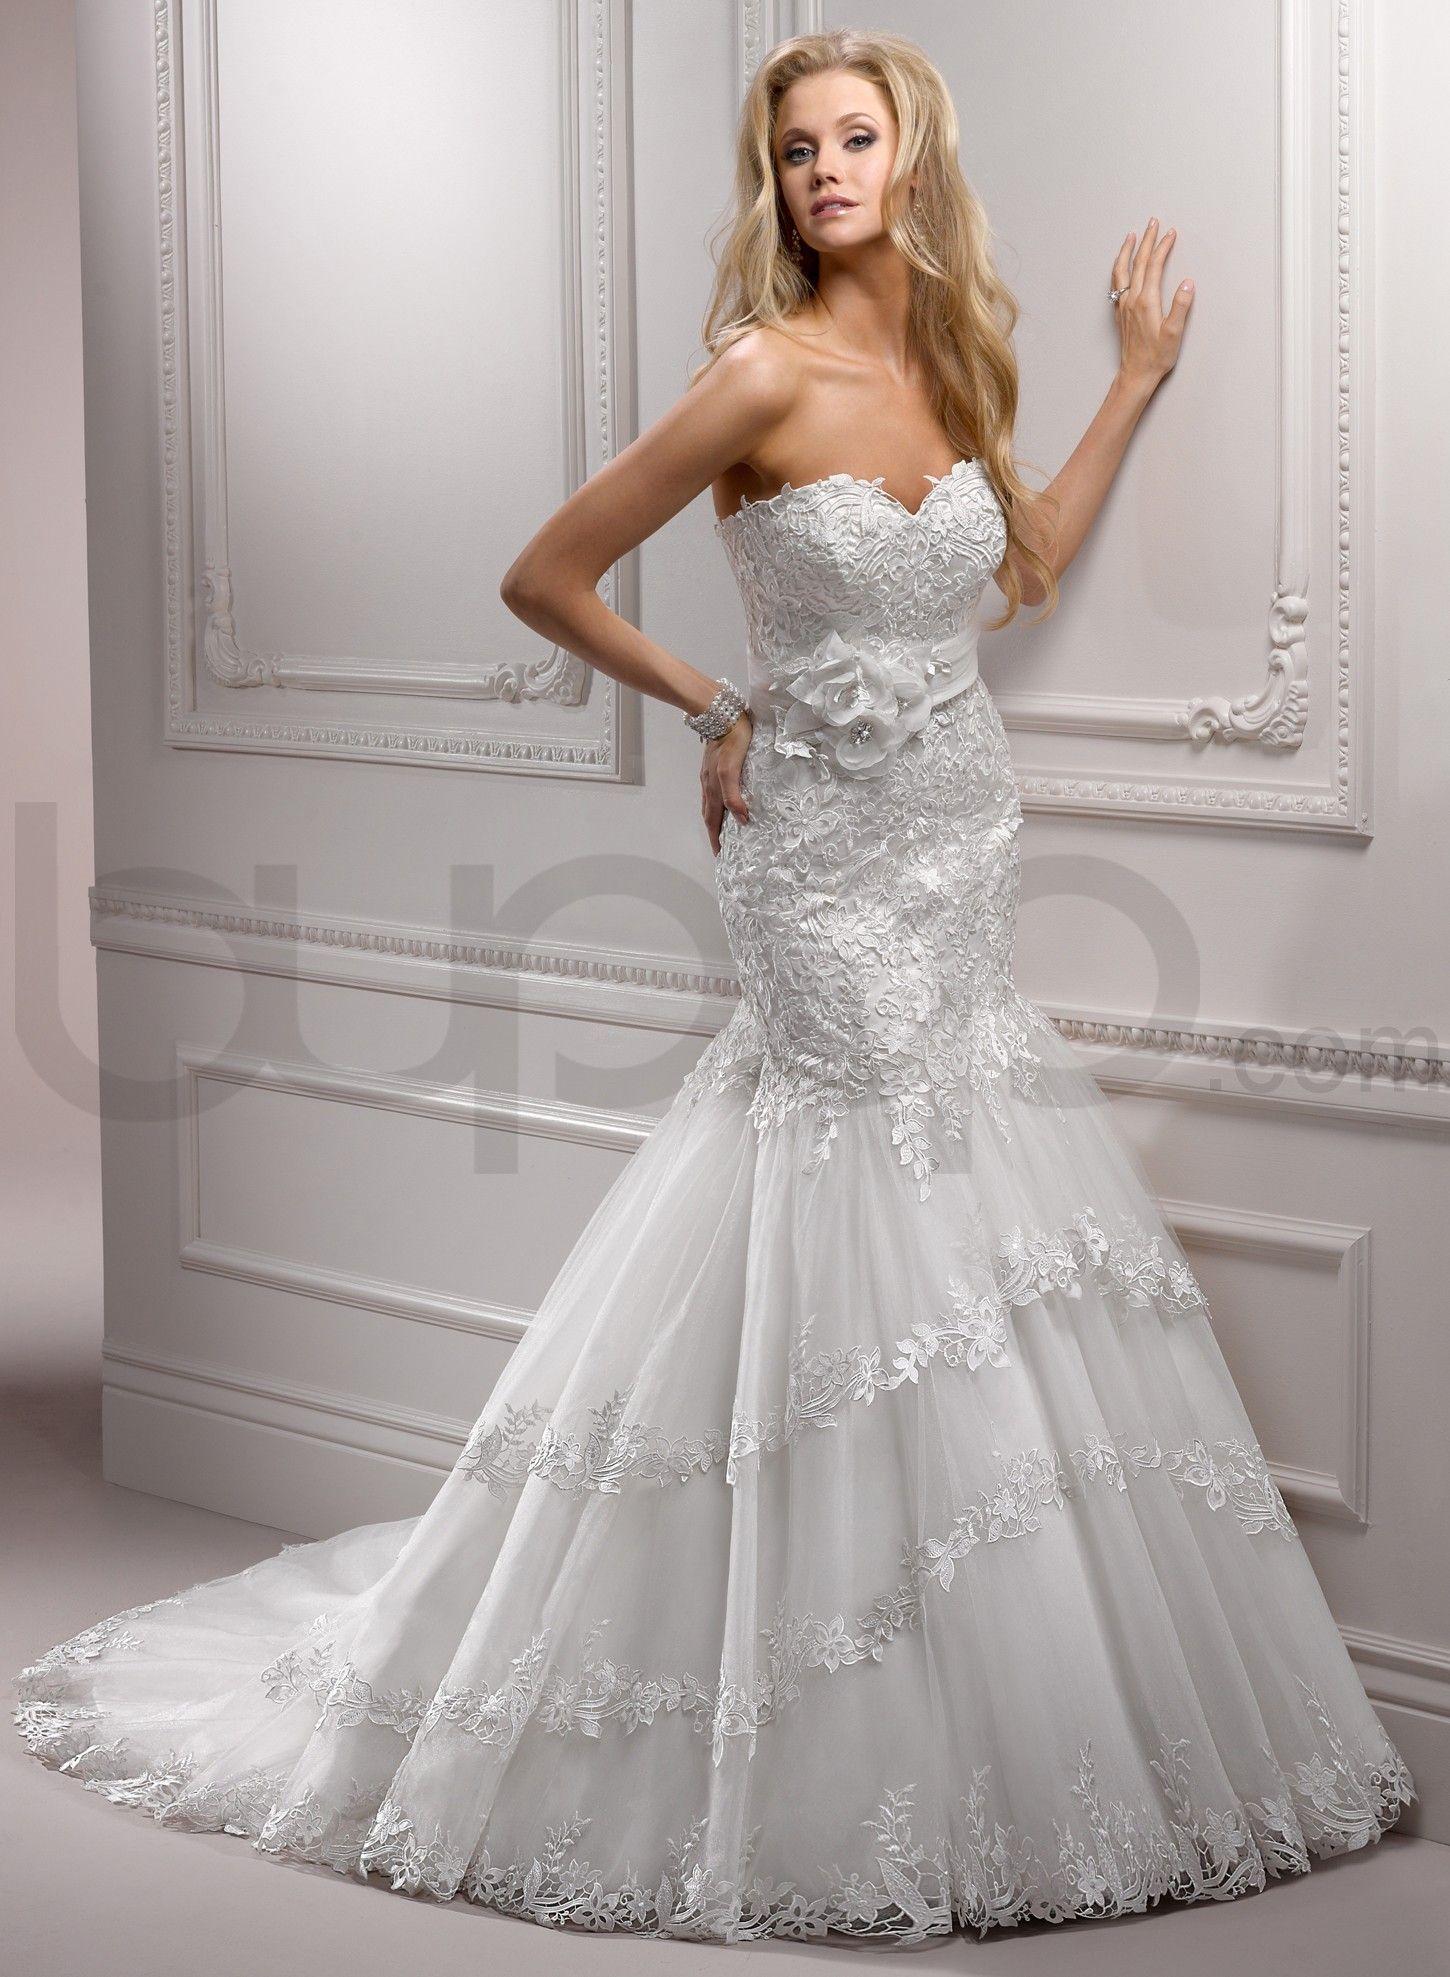 Wedding dresses sweetheart neckline mermaid style with bling wedding dresses sweetheart neckline mermaid style with bling ombrellifo Gallery